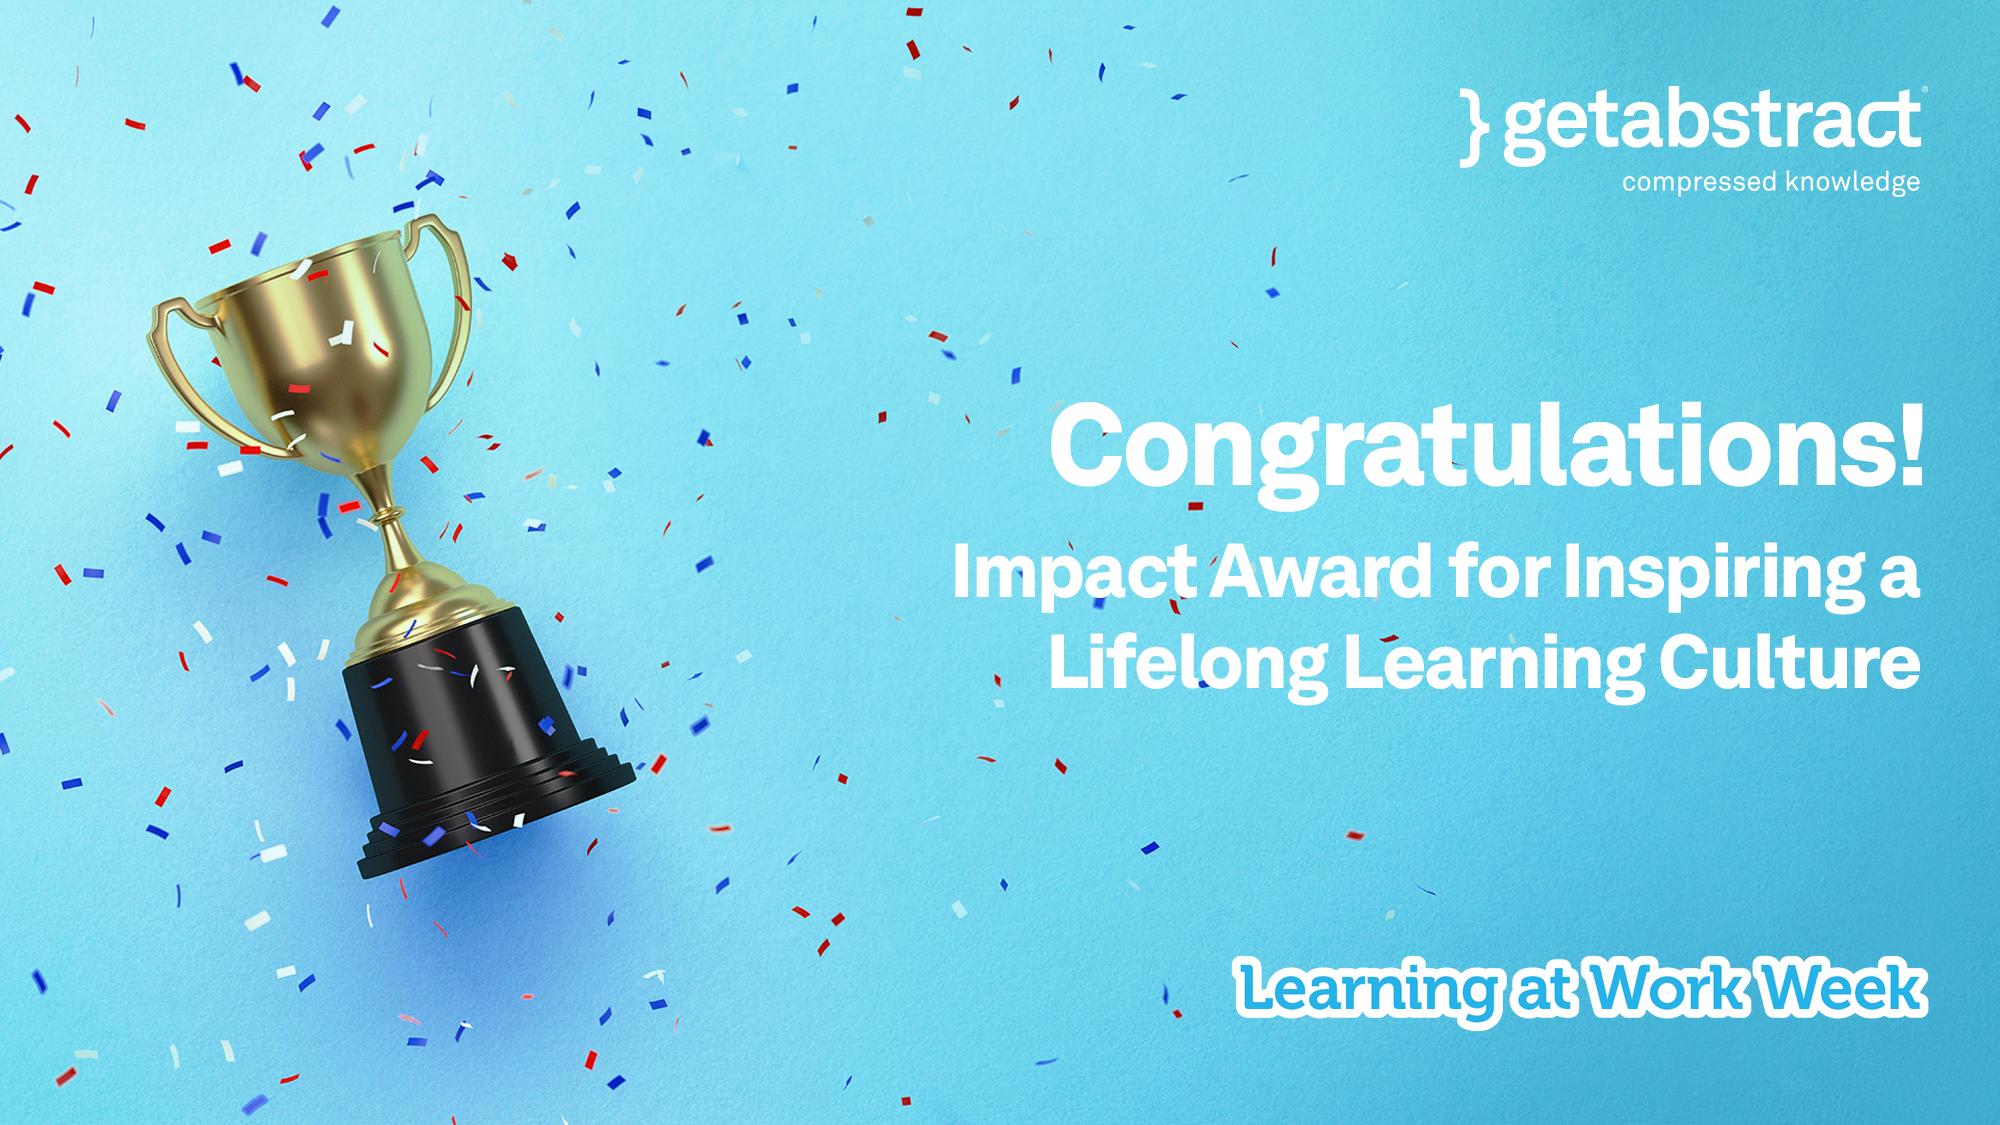 Learning at Work Week Impact Awards